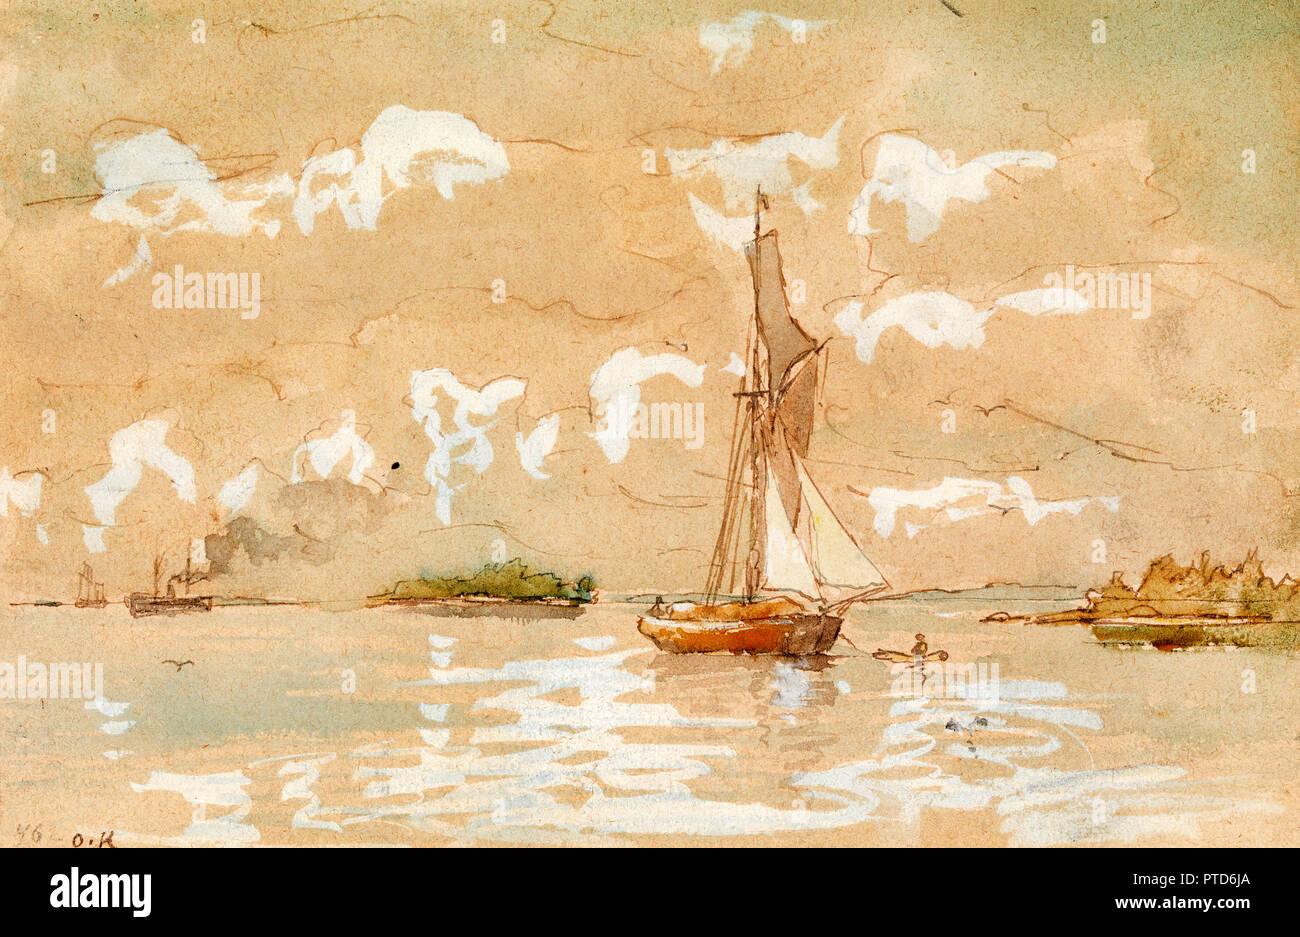 Oscar Kleineh, Sea Landscape, Circa 1890-1919, Watercolor, EMMA Espoo Museum of Modern Art, Finland. - Stock Image